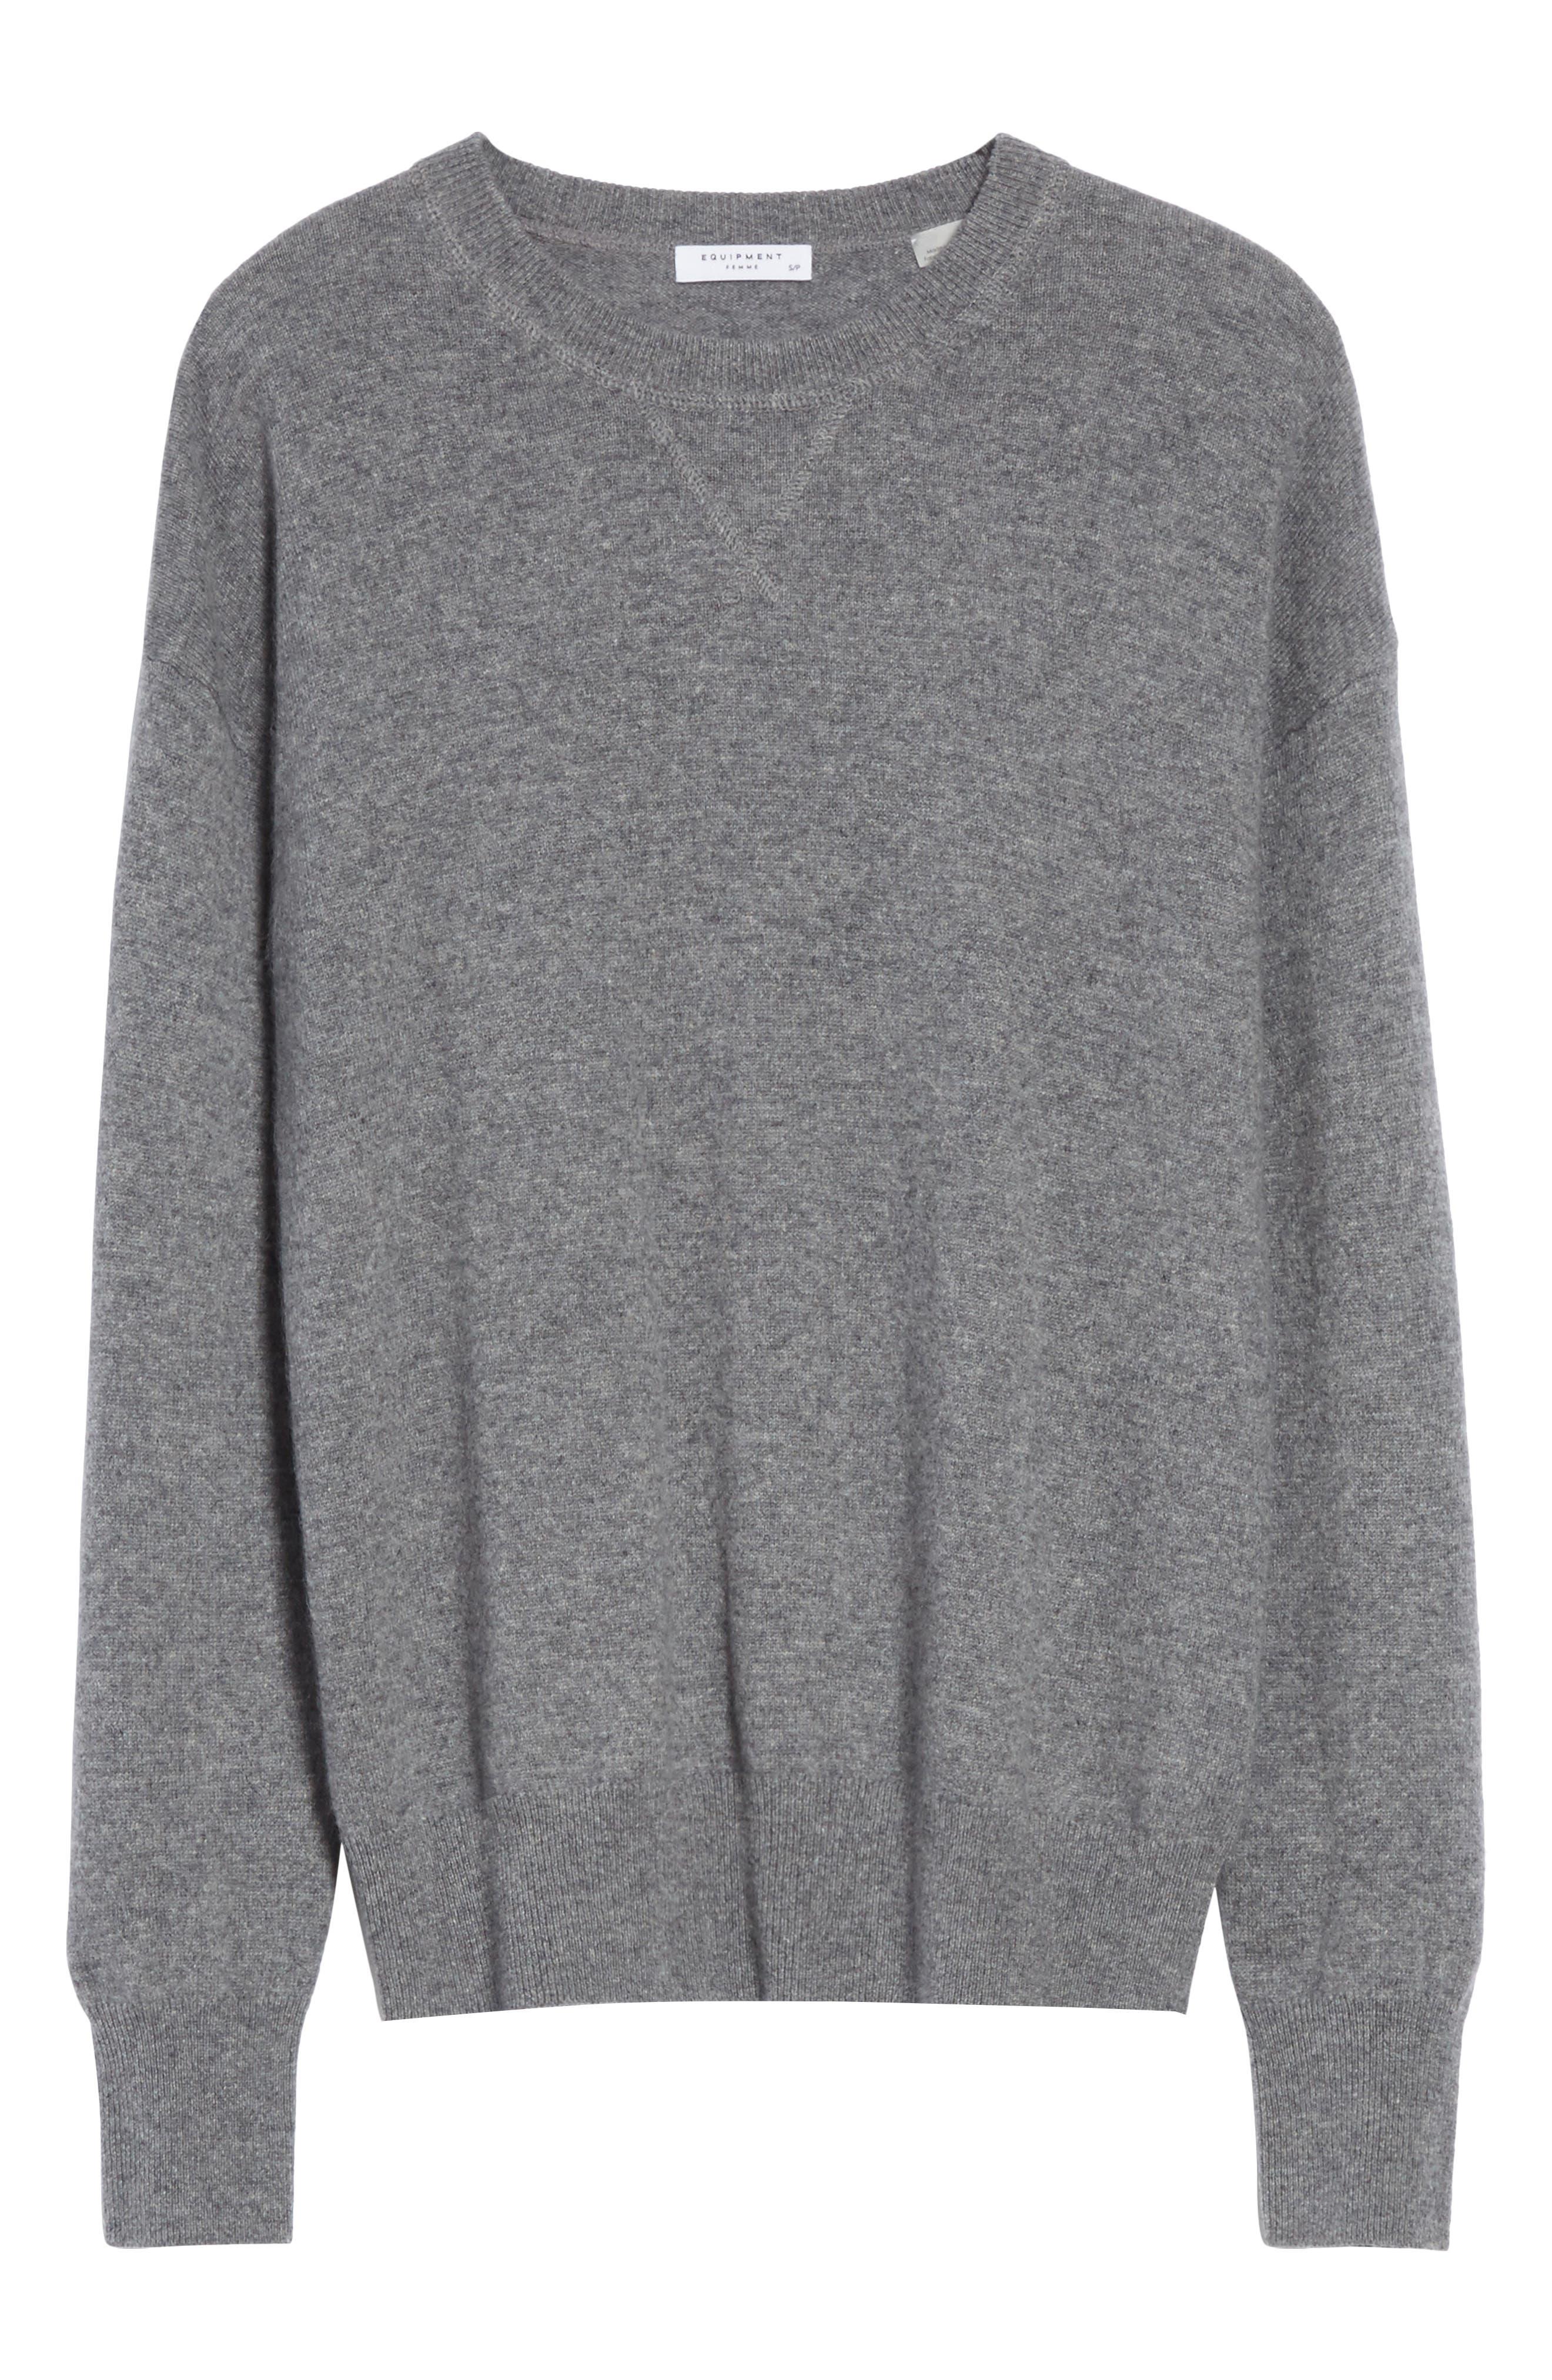 Renee Cashmere Sweatshirt,                             Alternate thumbnail 6, color,                             033